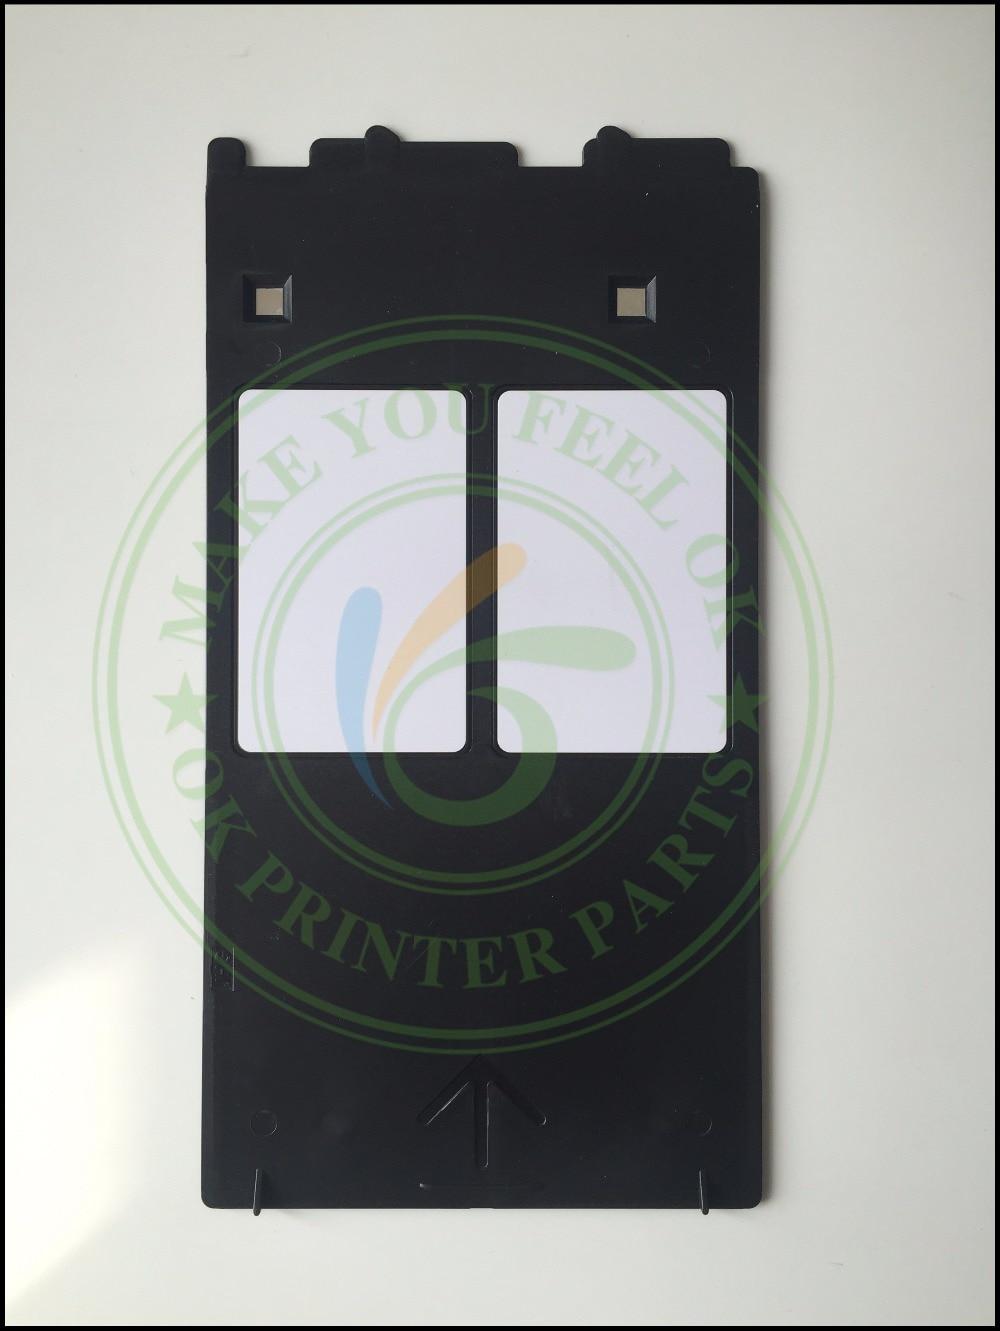 Inkjet Δίσκος κάρτας ID PVC Πλαστικός δίσκος Δίσκος PVC Δίσκος εκτύπωσης καρτών για Canon IP4600 4700 4760 4820 4850 4880 MP630 640 MG5250 8150